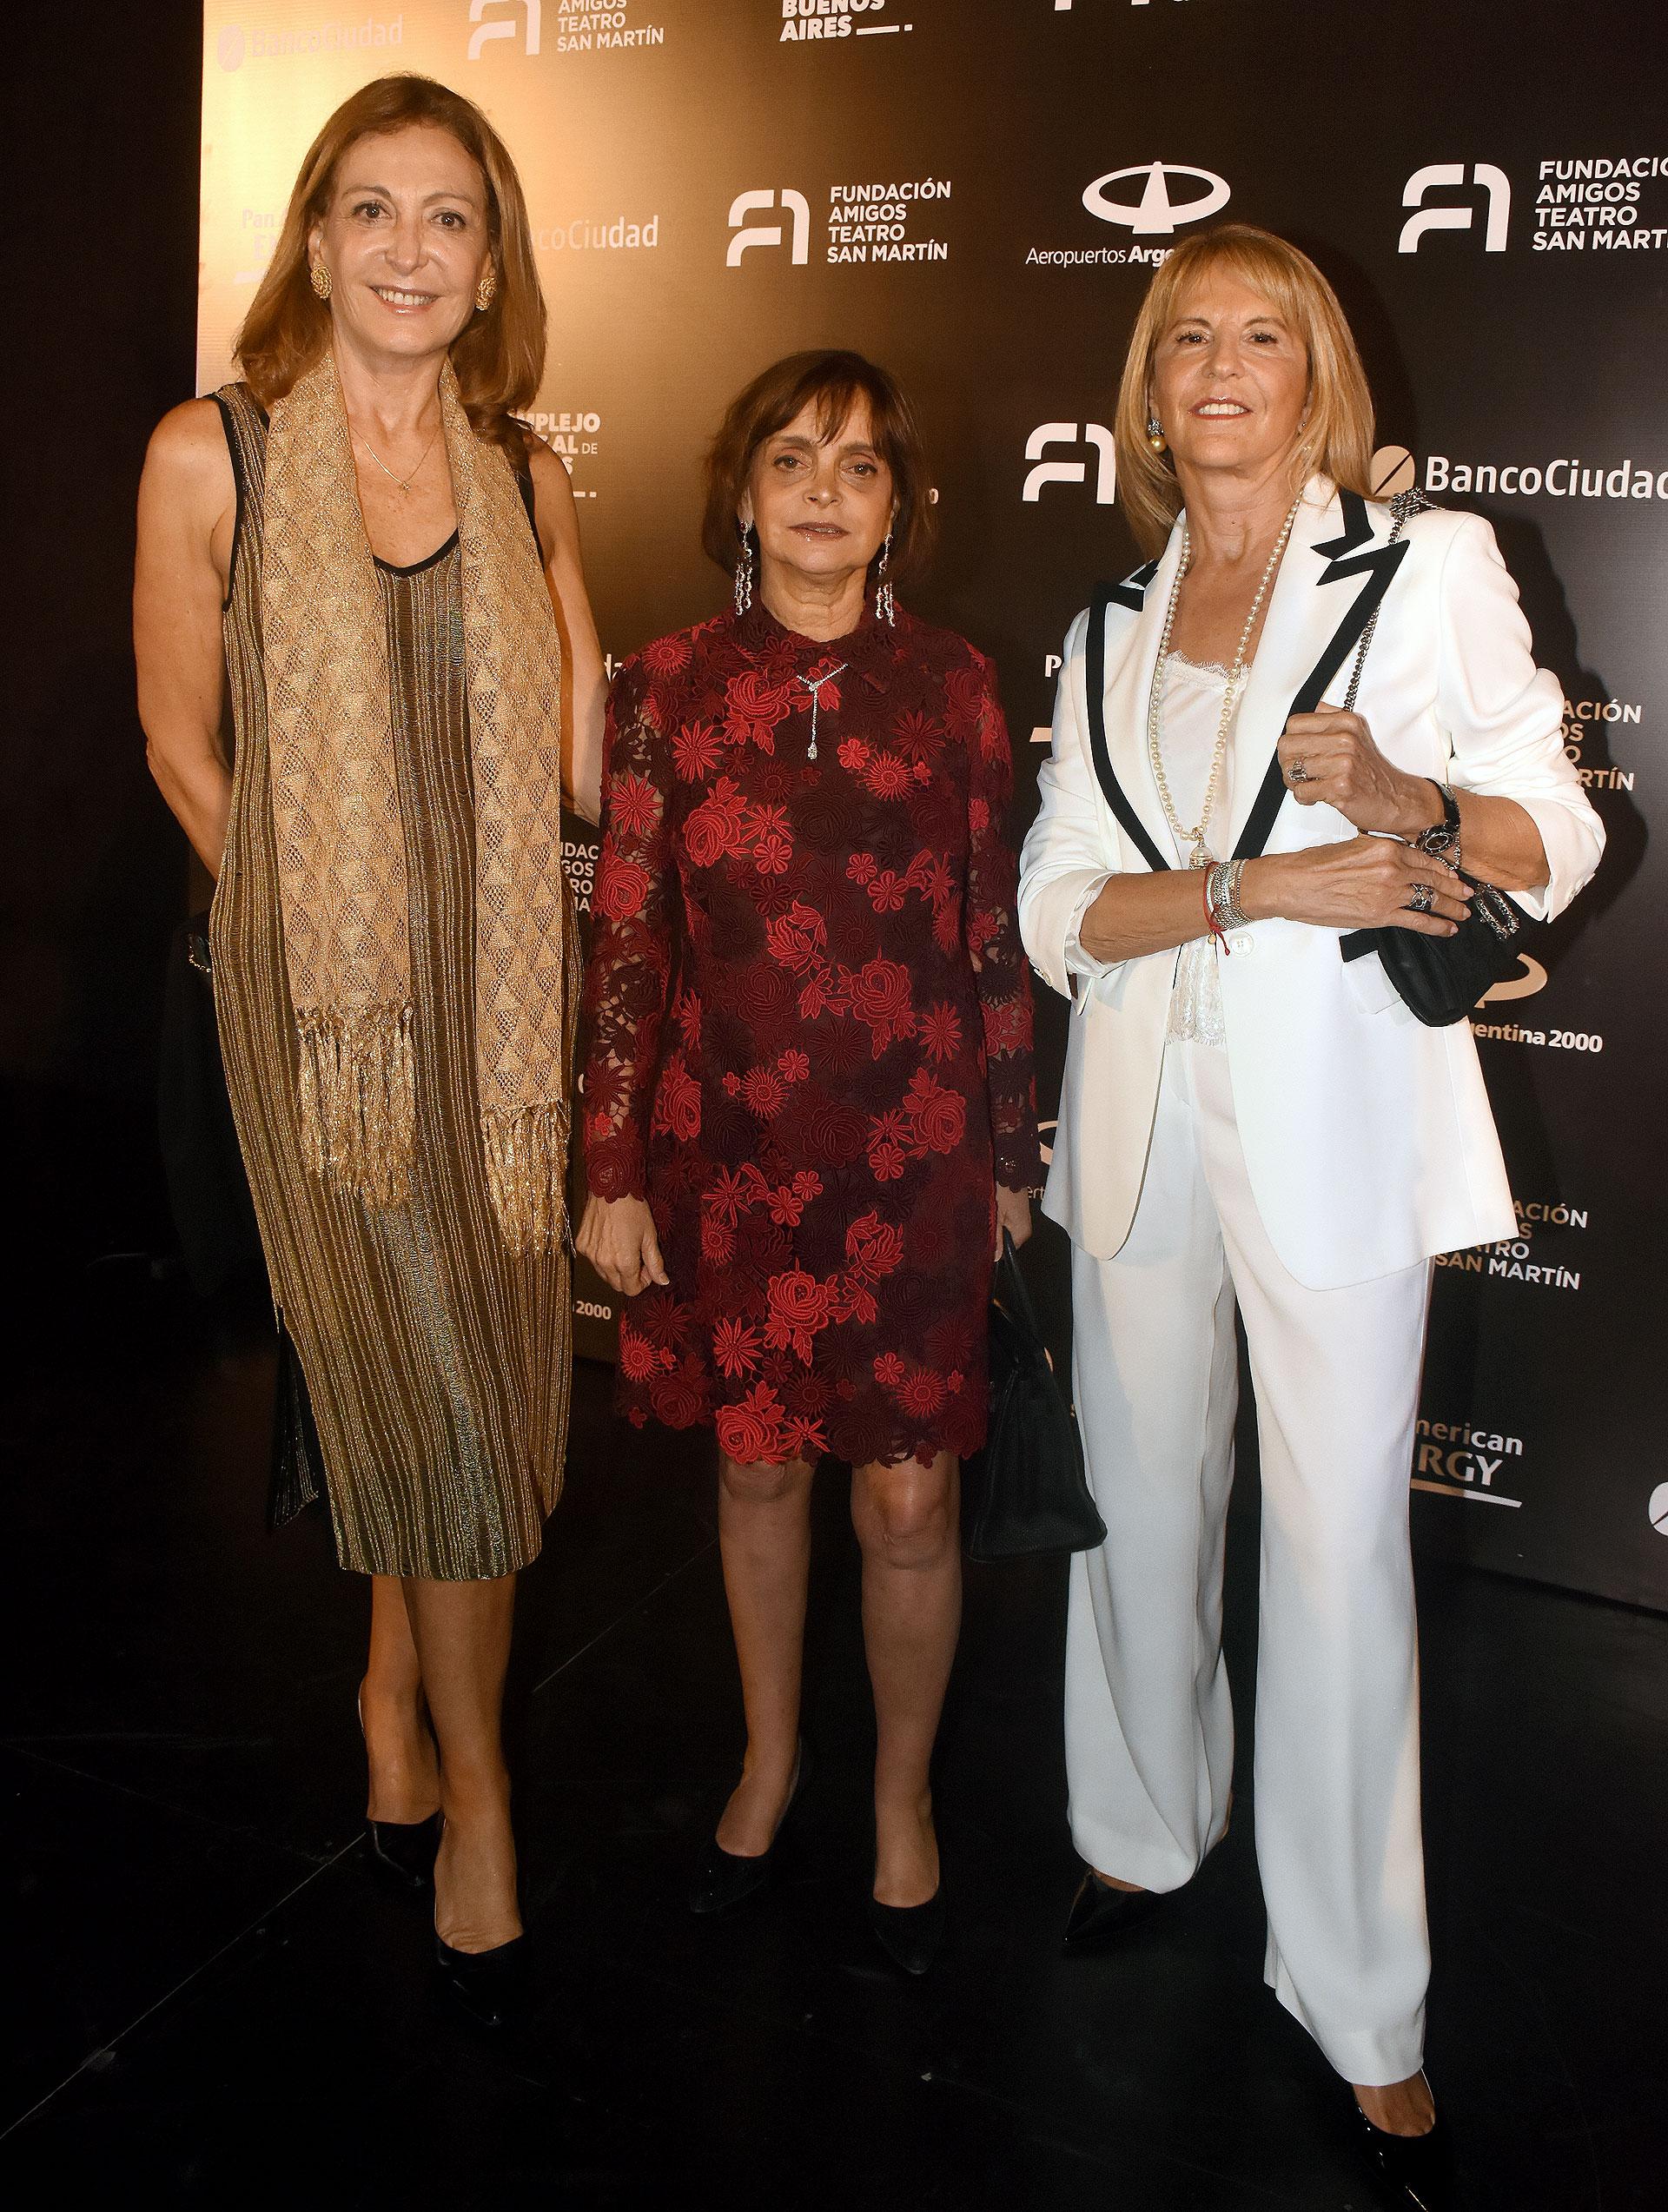 Mariel Llorens de Quintana, Claudia Stad y Mónica Balestrini de Aufiero